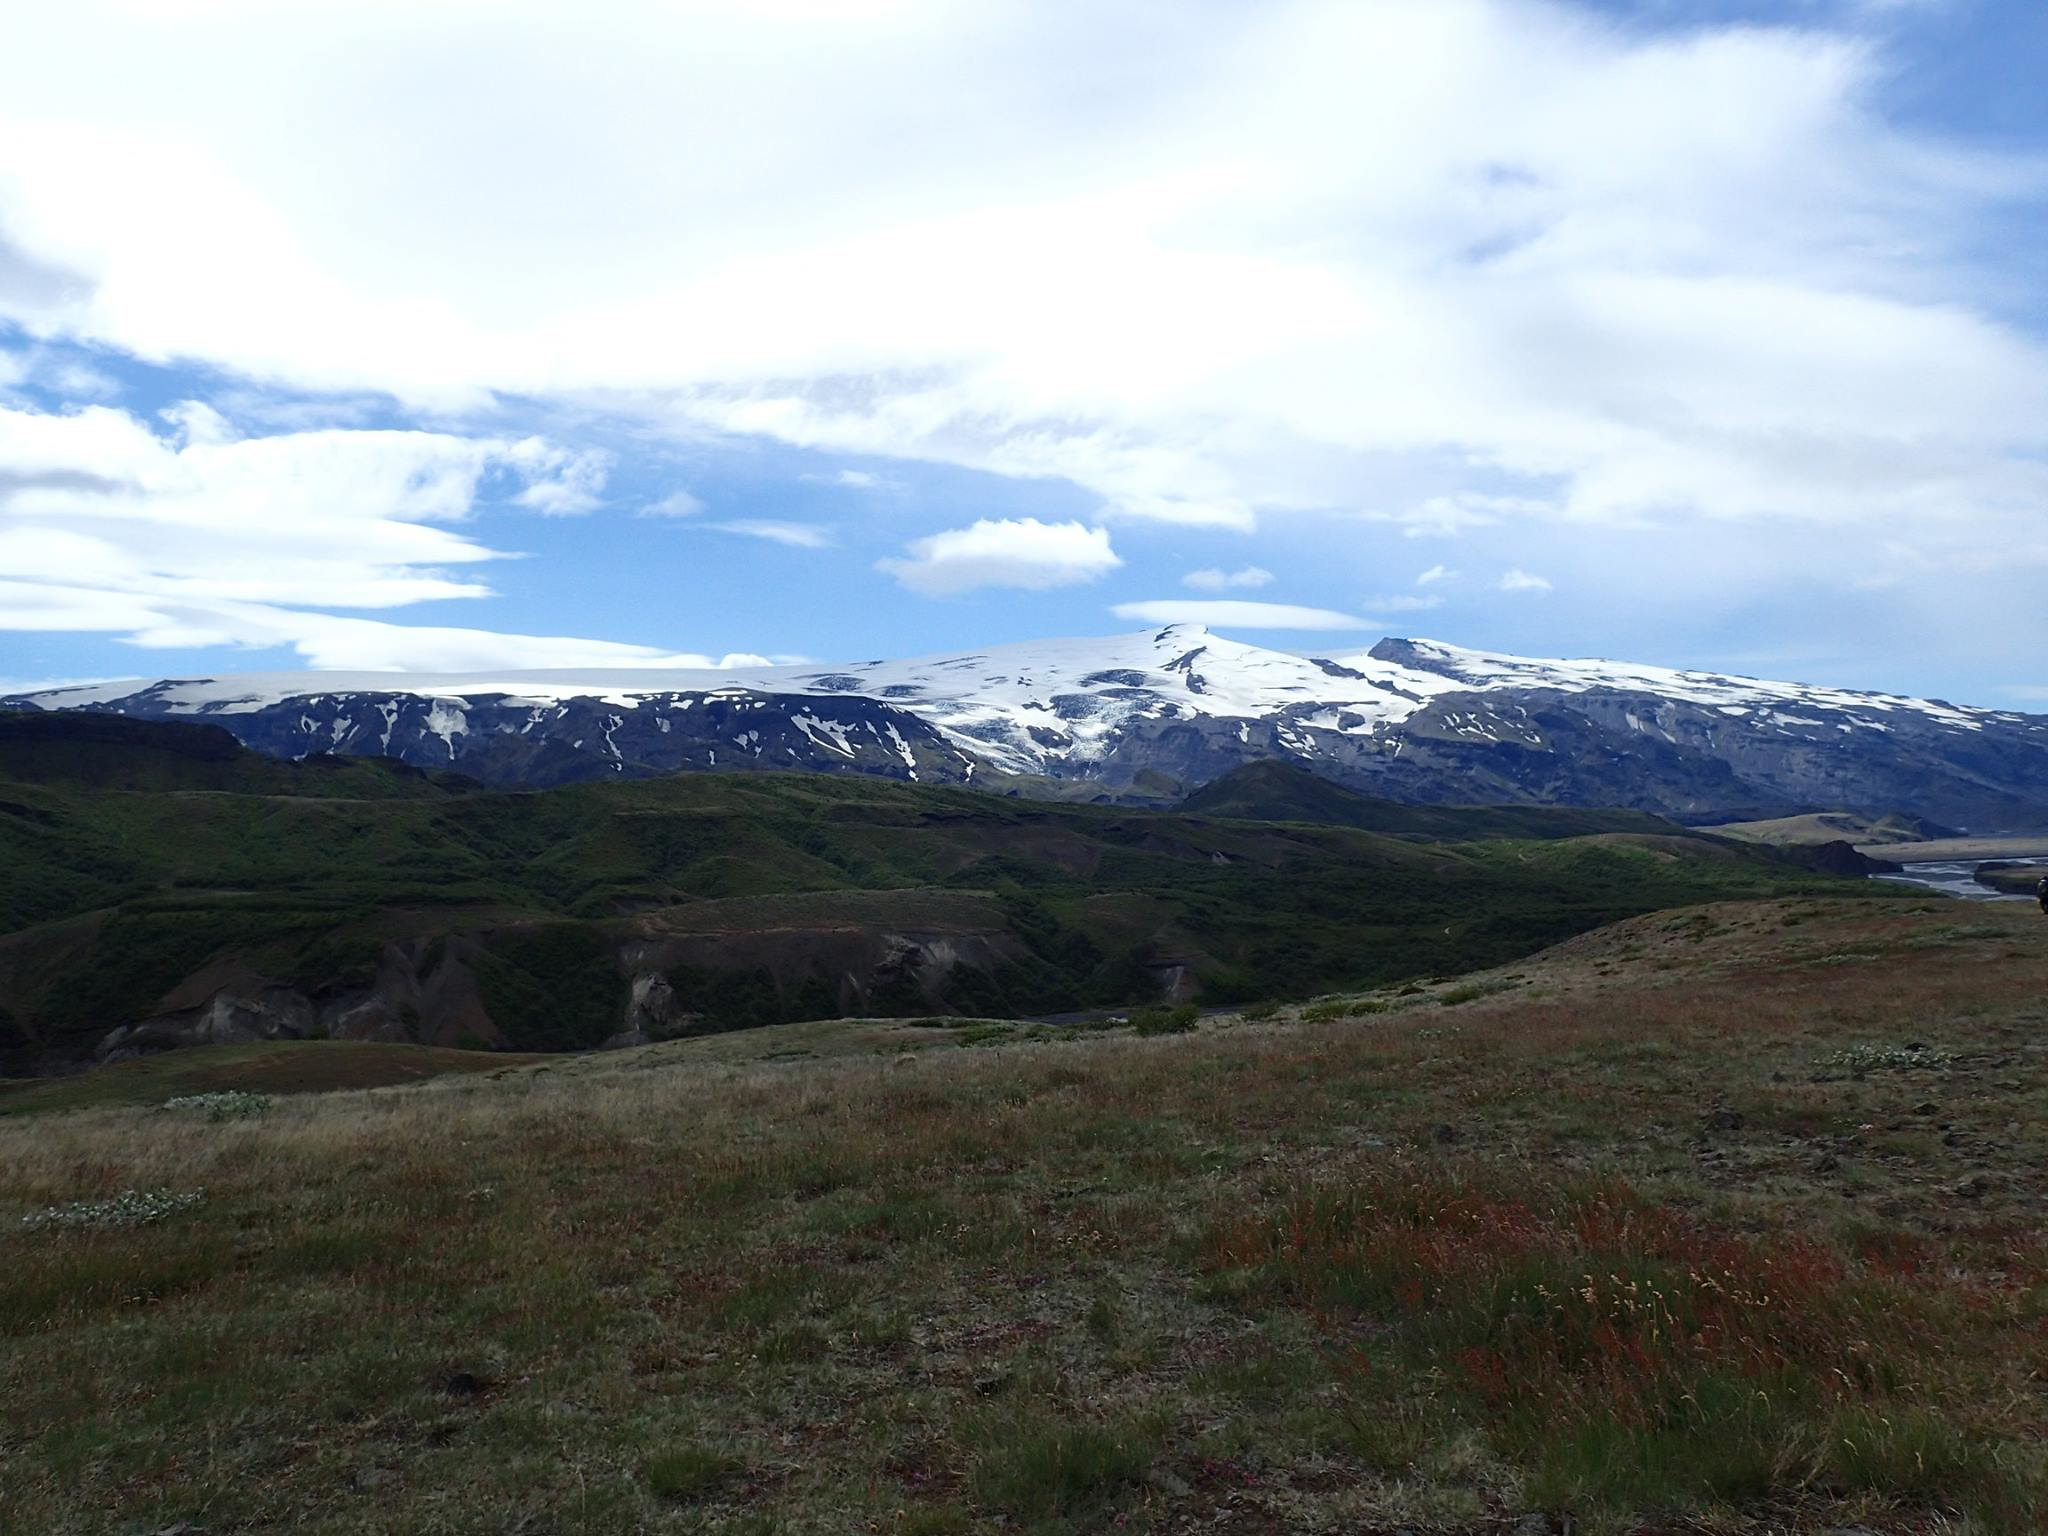 Volanco: Eyjafjallajökull - last erupted in 2010